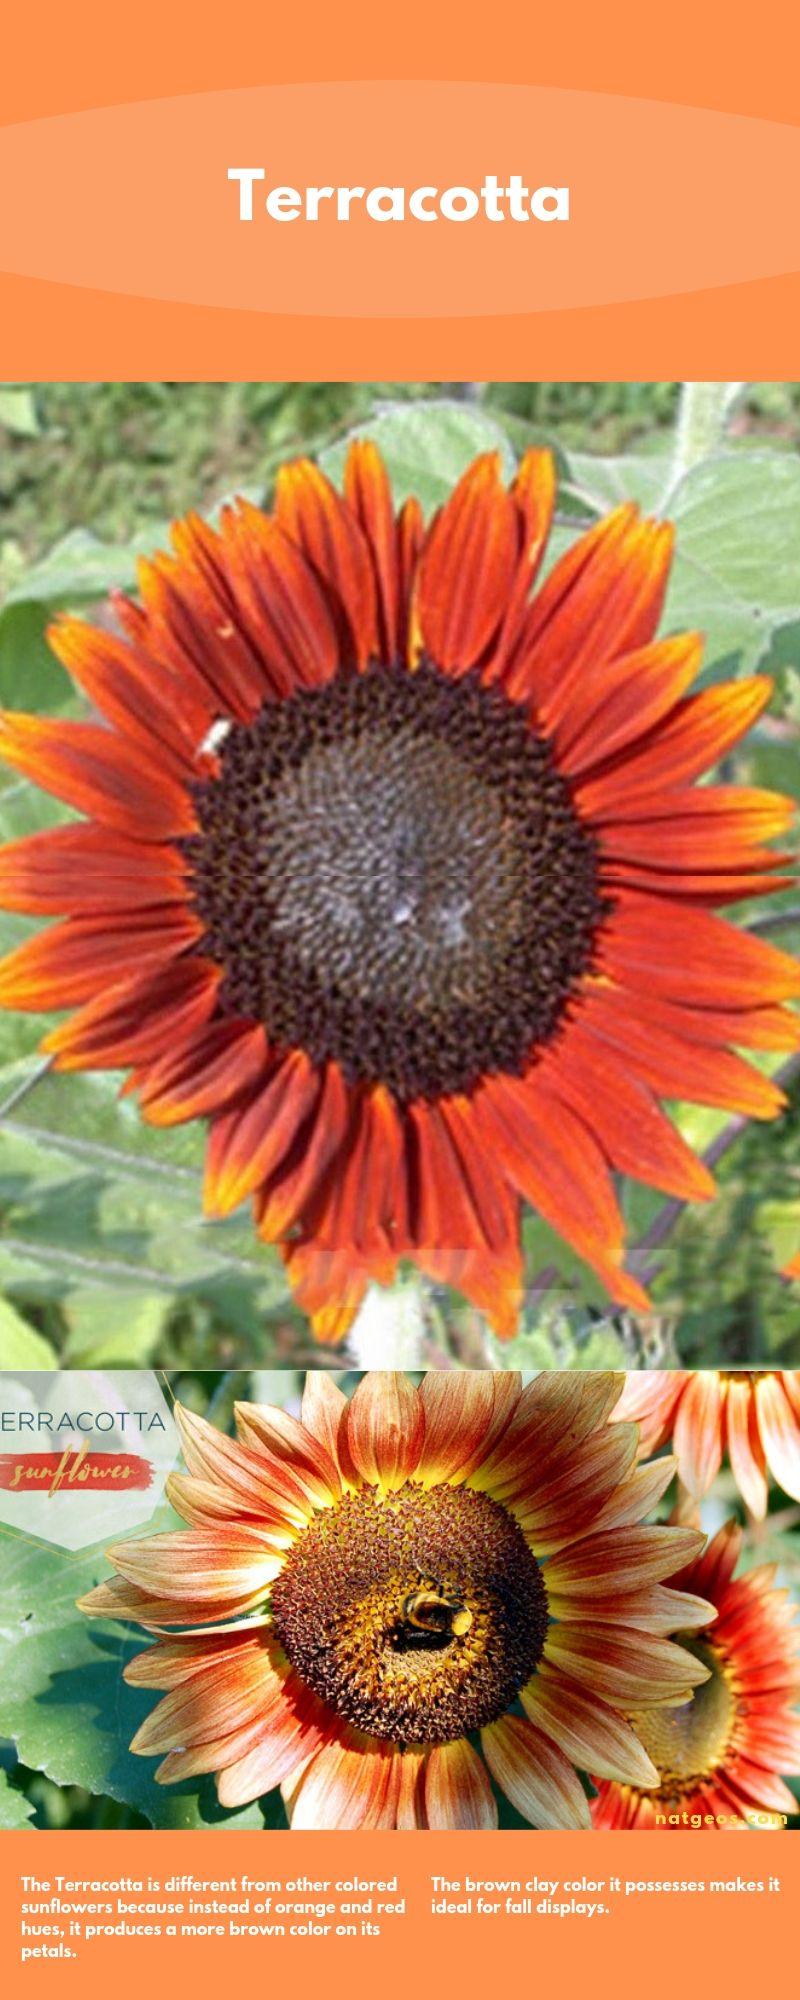 Types of Sunflowers; Terracotta